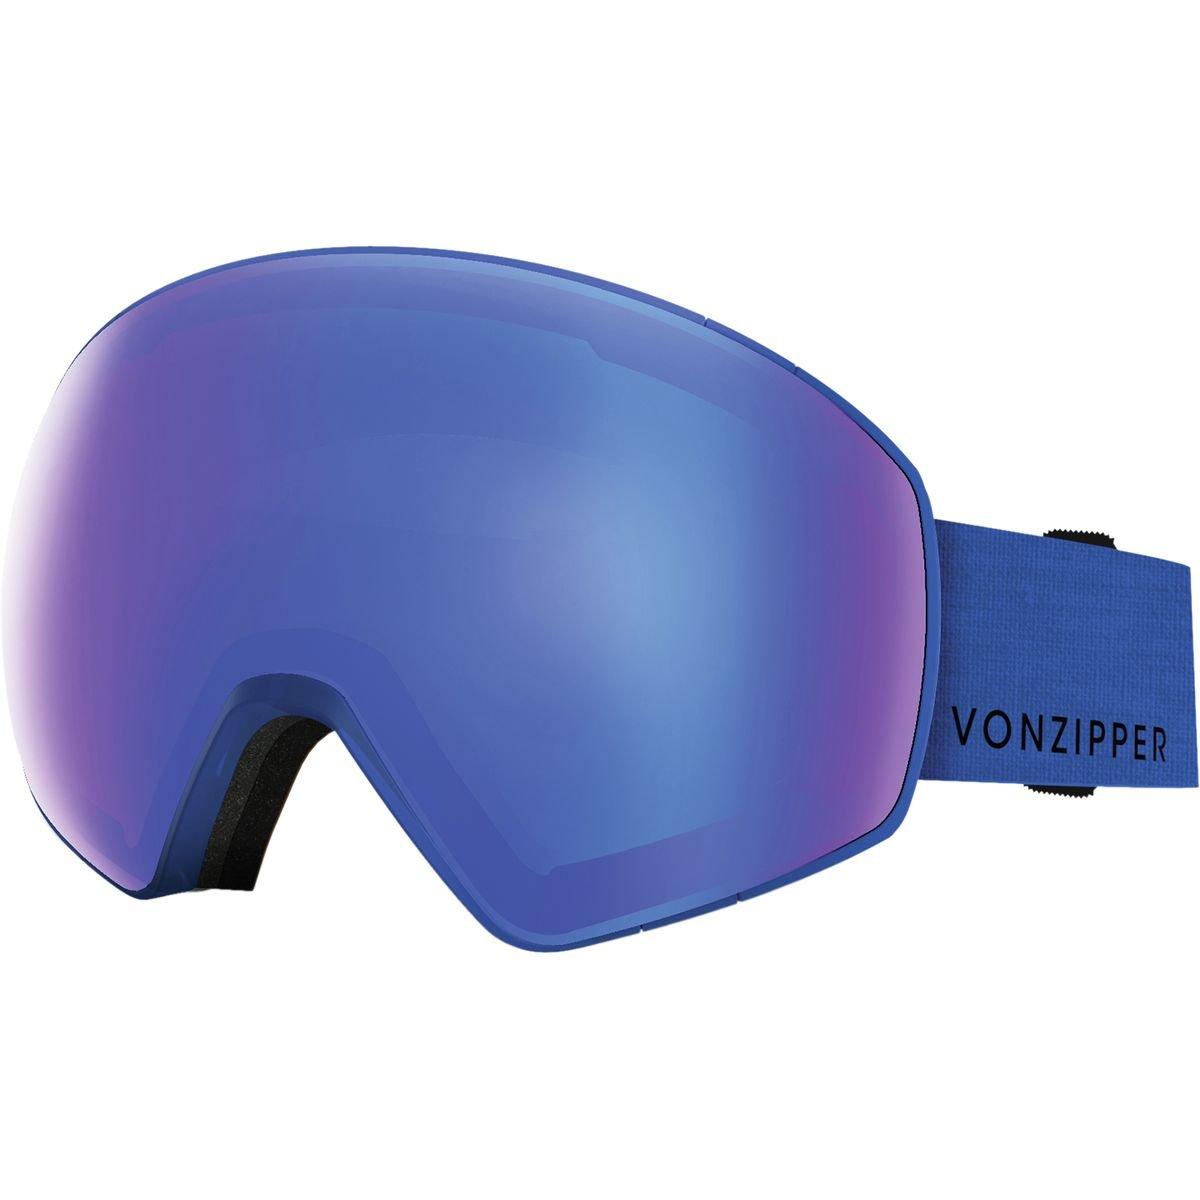 VonZipper Jetpack Goggles Mono Blue Satin One Size GMSNGJET-BLU